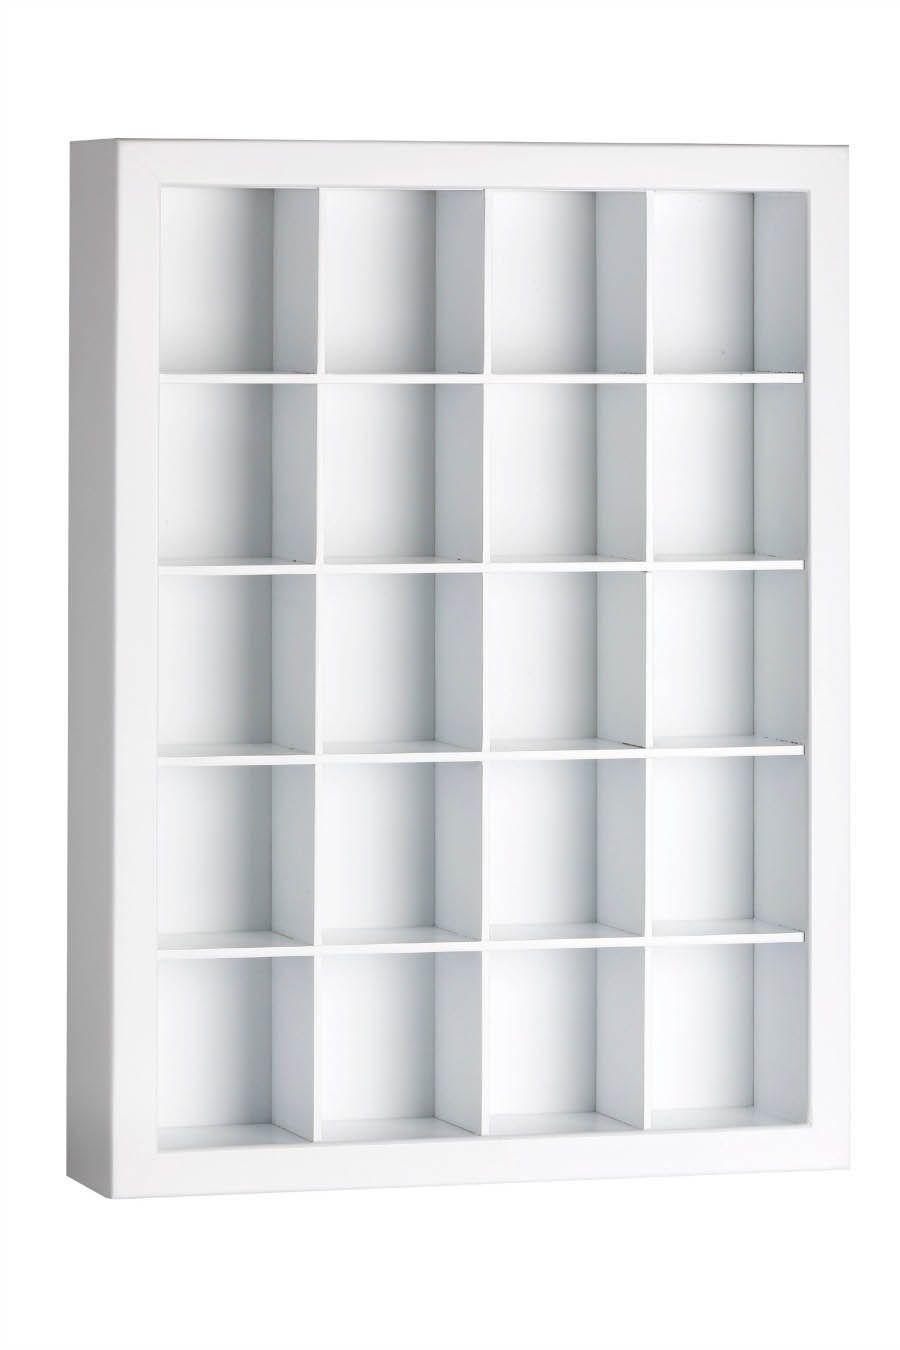 Best Kids Kitchen Wall Decor Shadow Boxes White Kitchen Decor 400 x 300